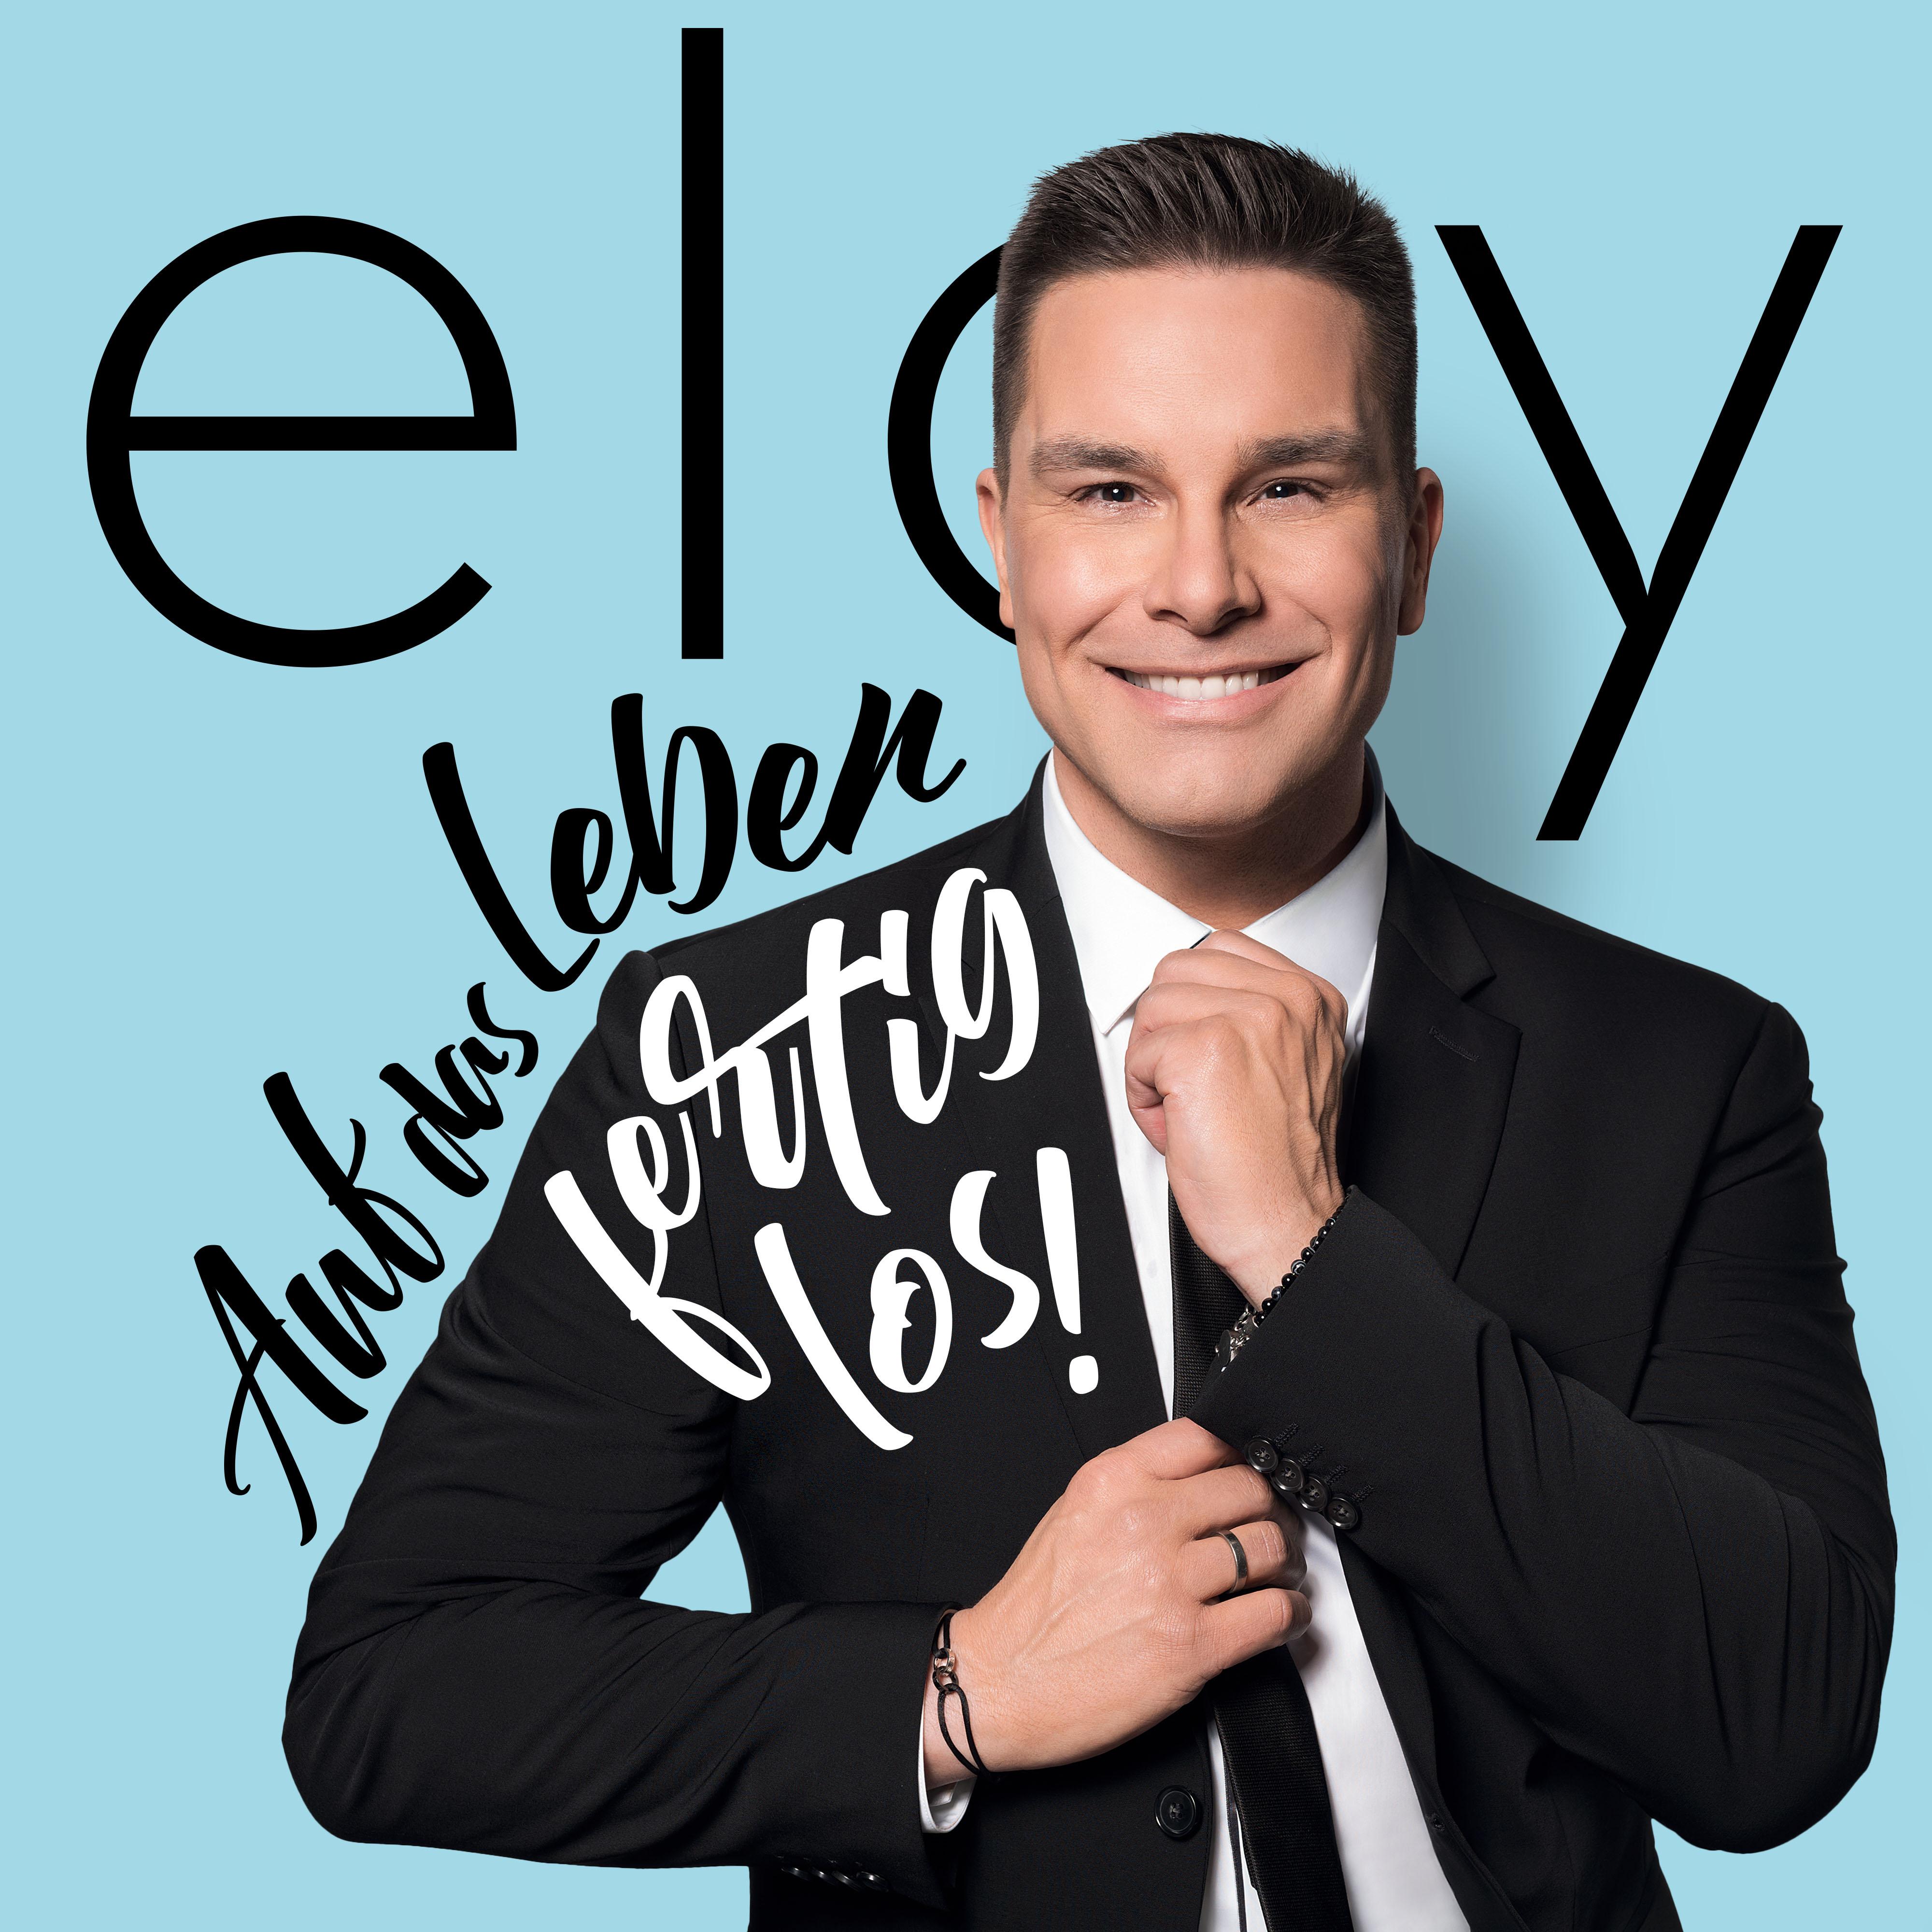 ELOY DE JONG * Auf das Leben – fertig – los! (CD) * Auch als limitierte Fanbox erhältlich!